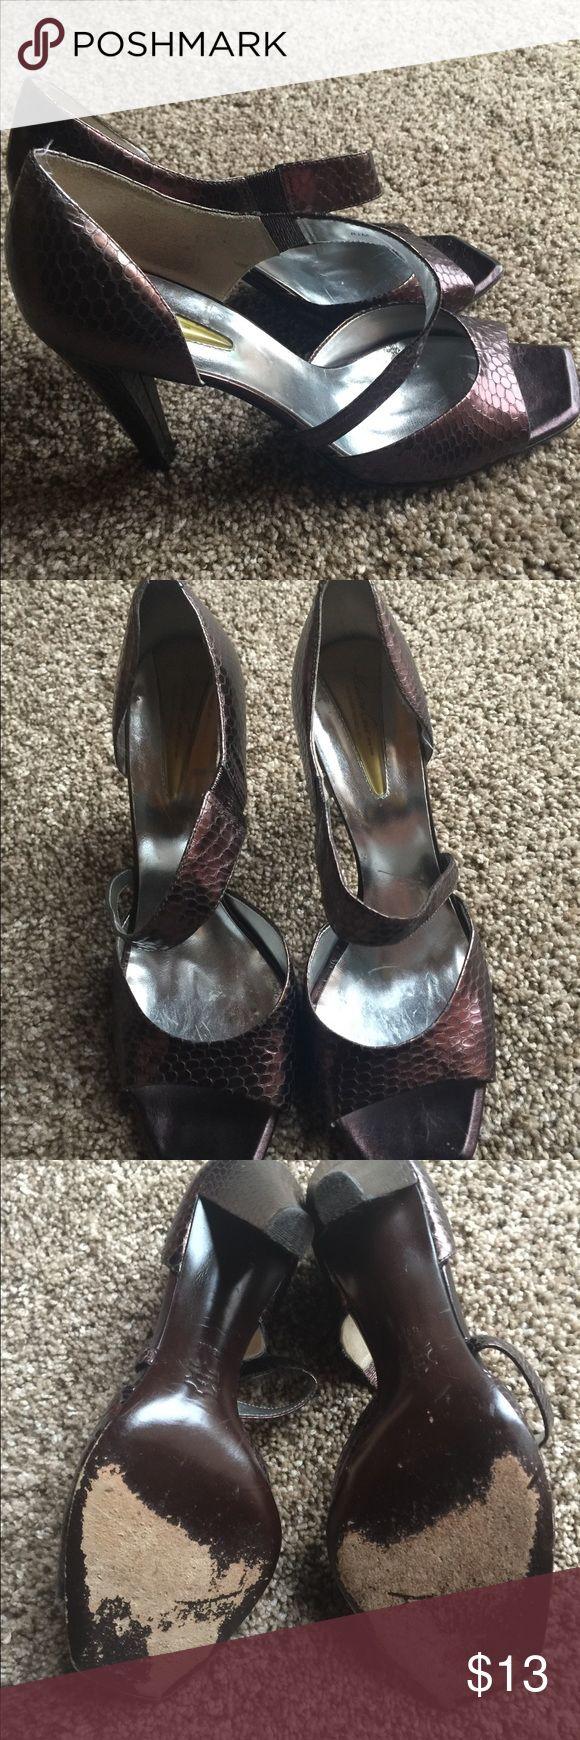 ** KENNETH COLE** ~ Snakeskin Heels ~ Size 8 1/2 ** KENNETH COLE** ~ Snakeskin Heels with Silver Technology ~ Size 8 1/2 ~ Burgundy Snakeskin ~Worn and sanitized Kenneth Cole Shoes Heels